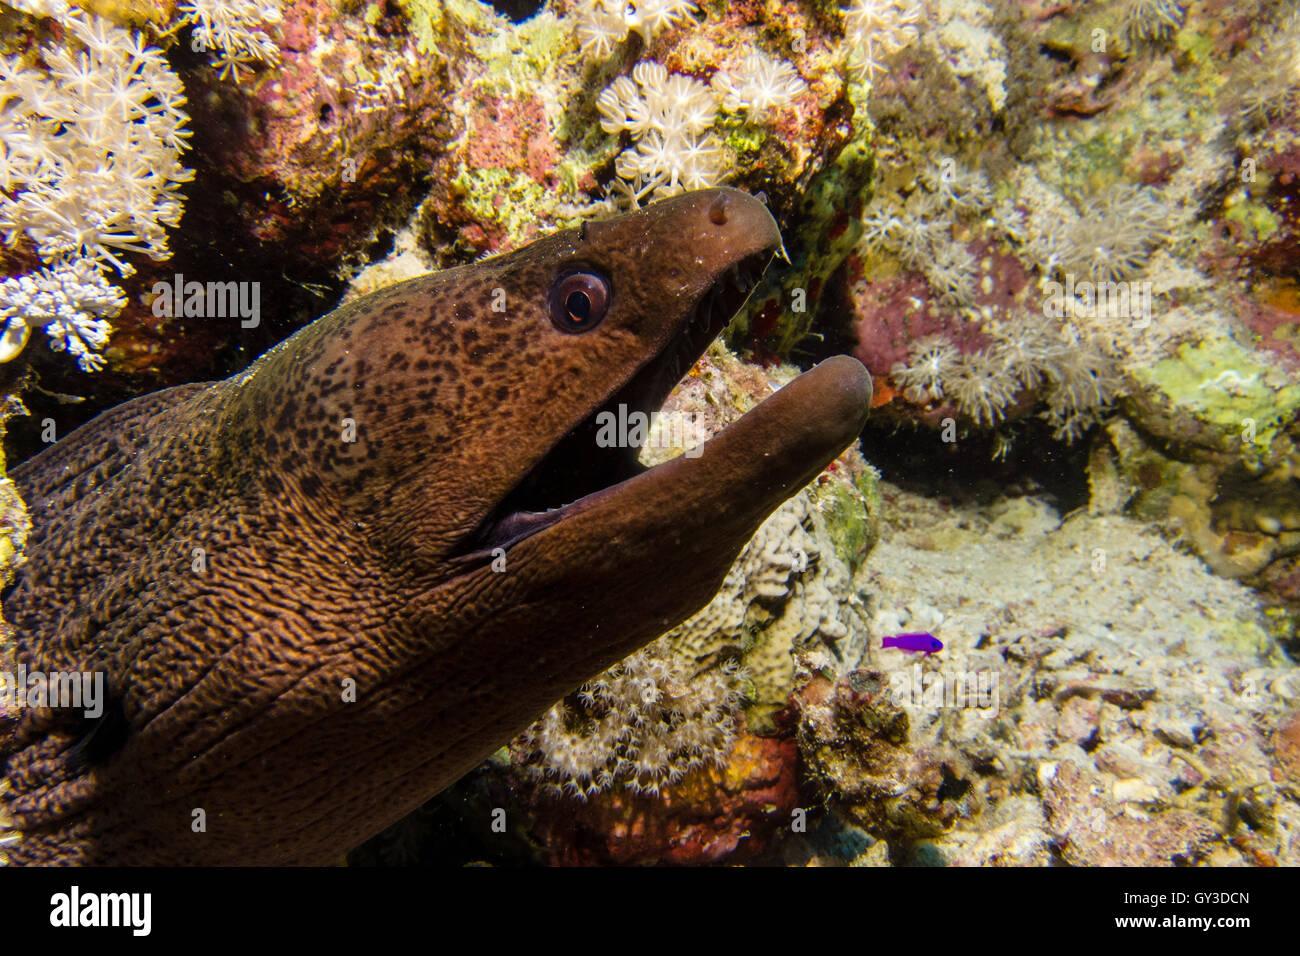 Big black moray eel - Stock Image